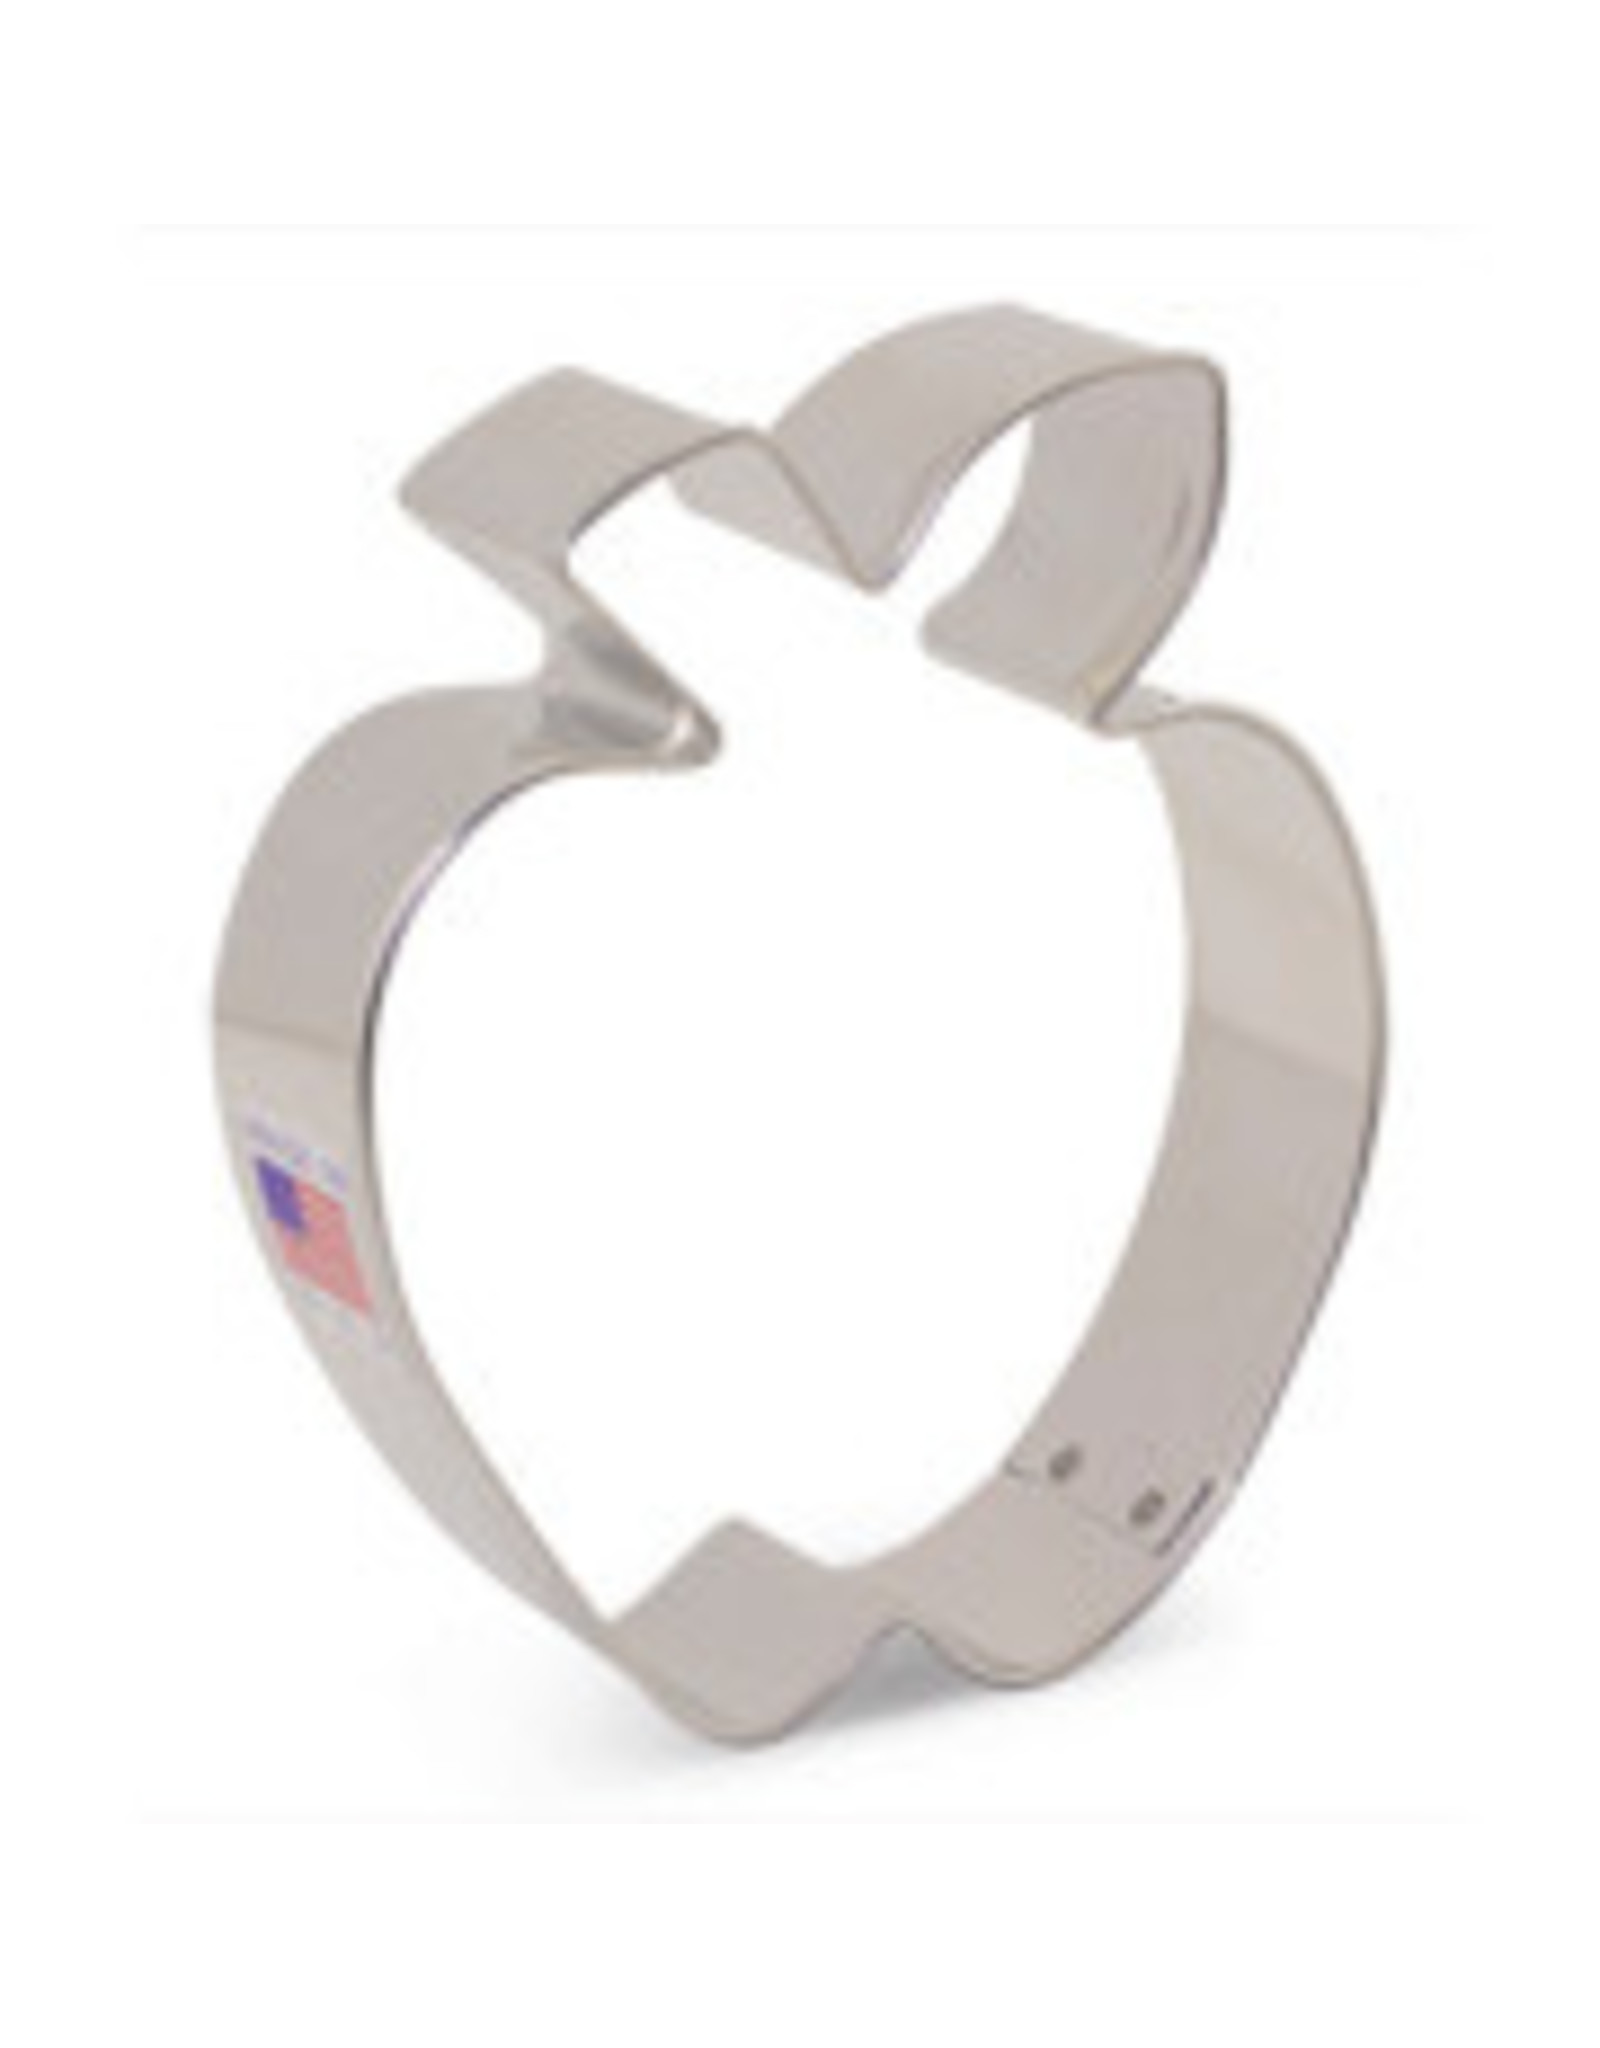 Cookie Cutter- Apple